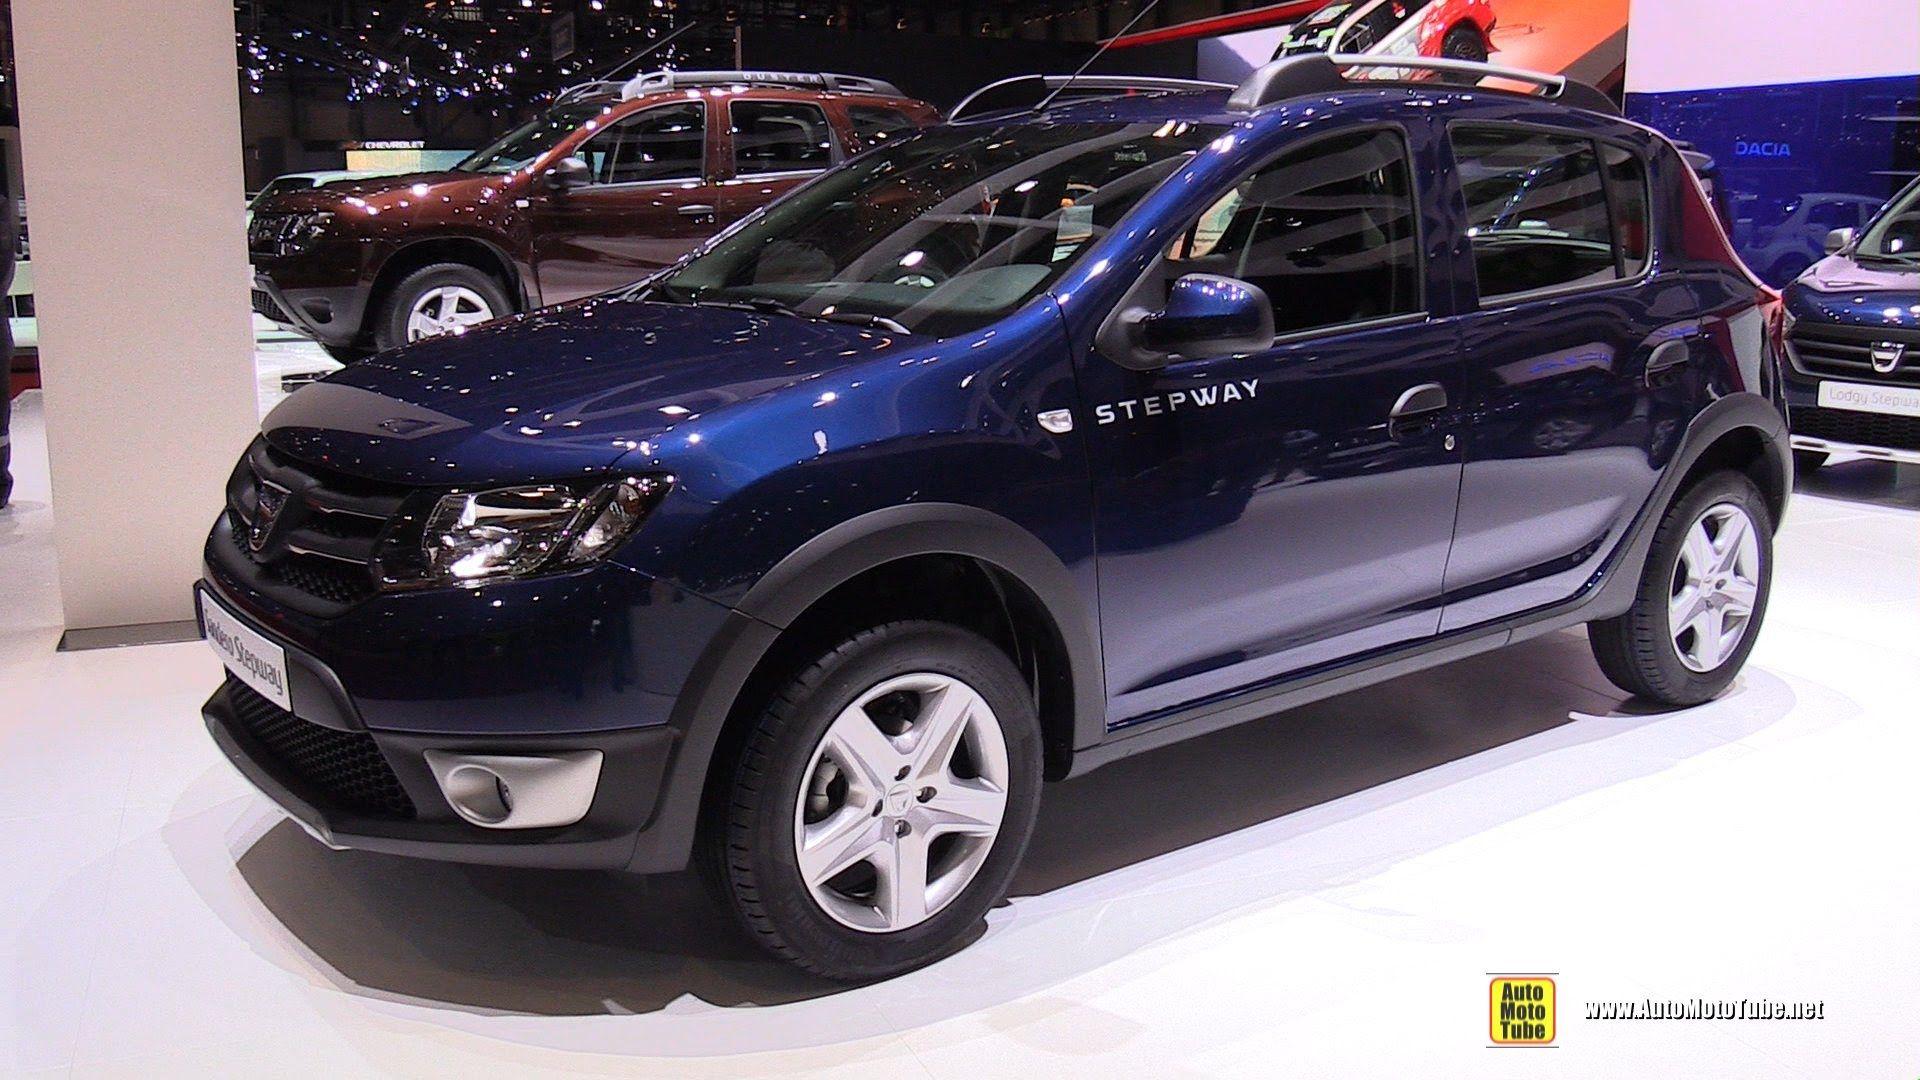 2016 Dacia Sandero Stepway Exterior and Interior Walkaround 2016 ...